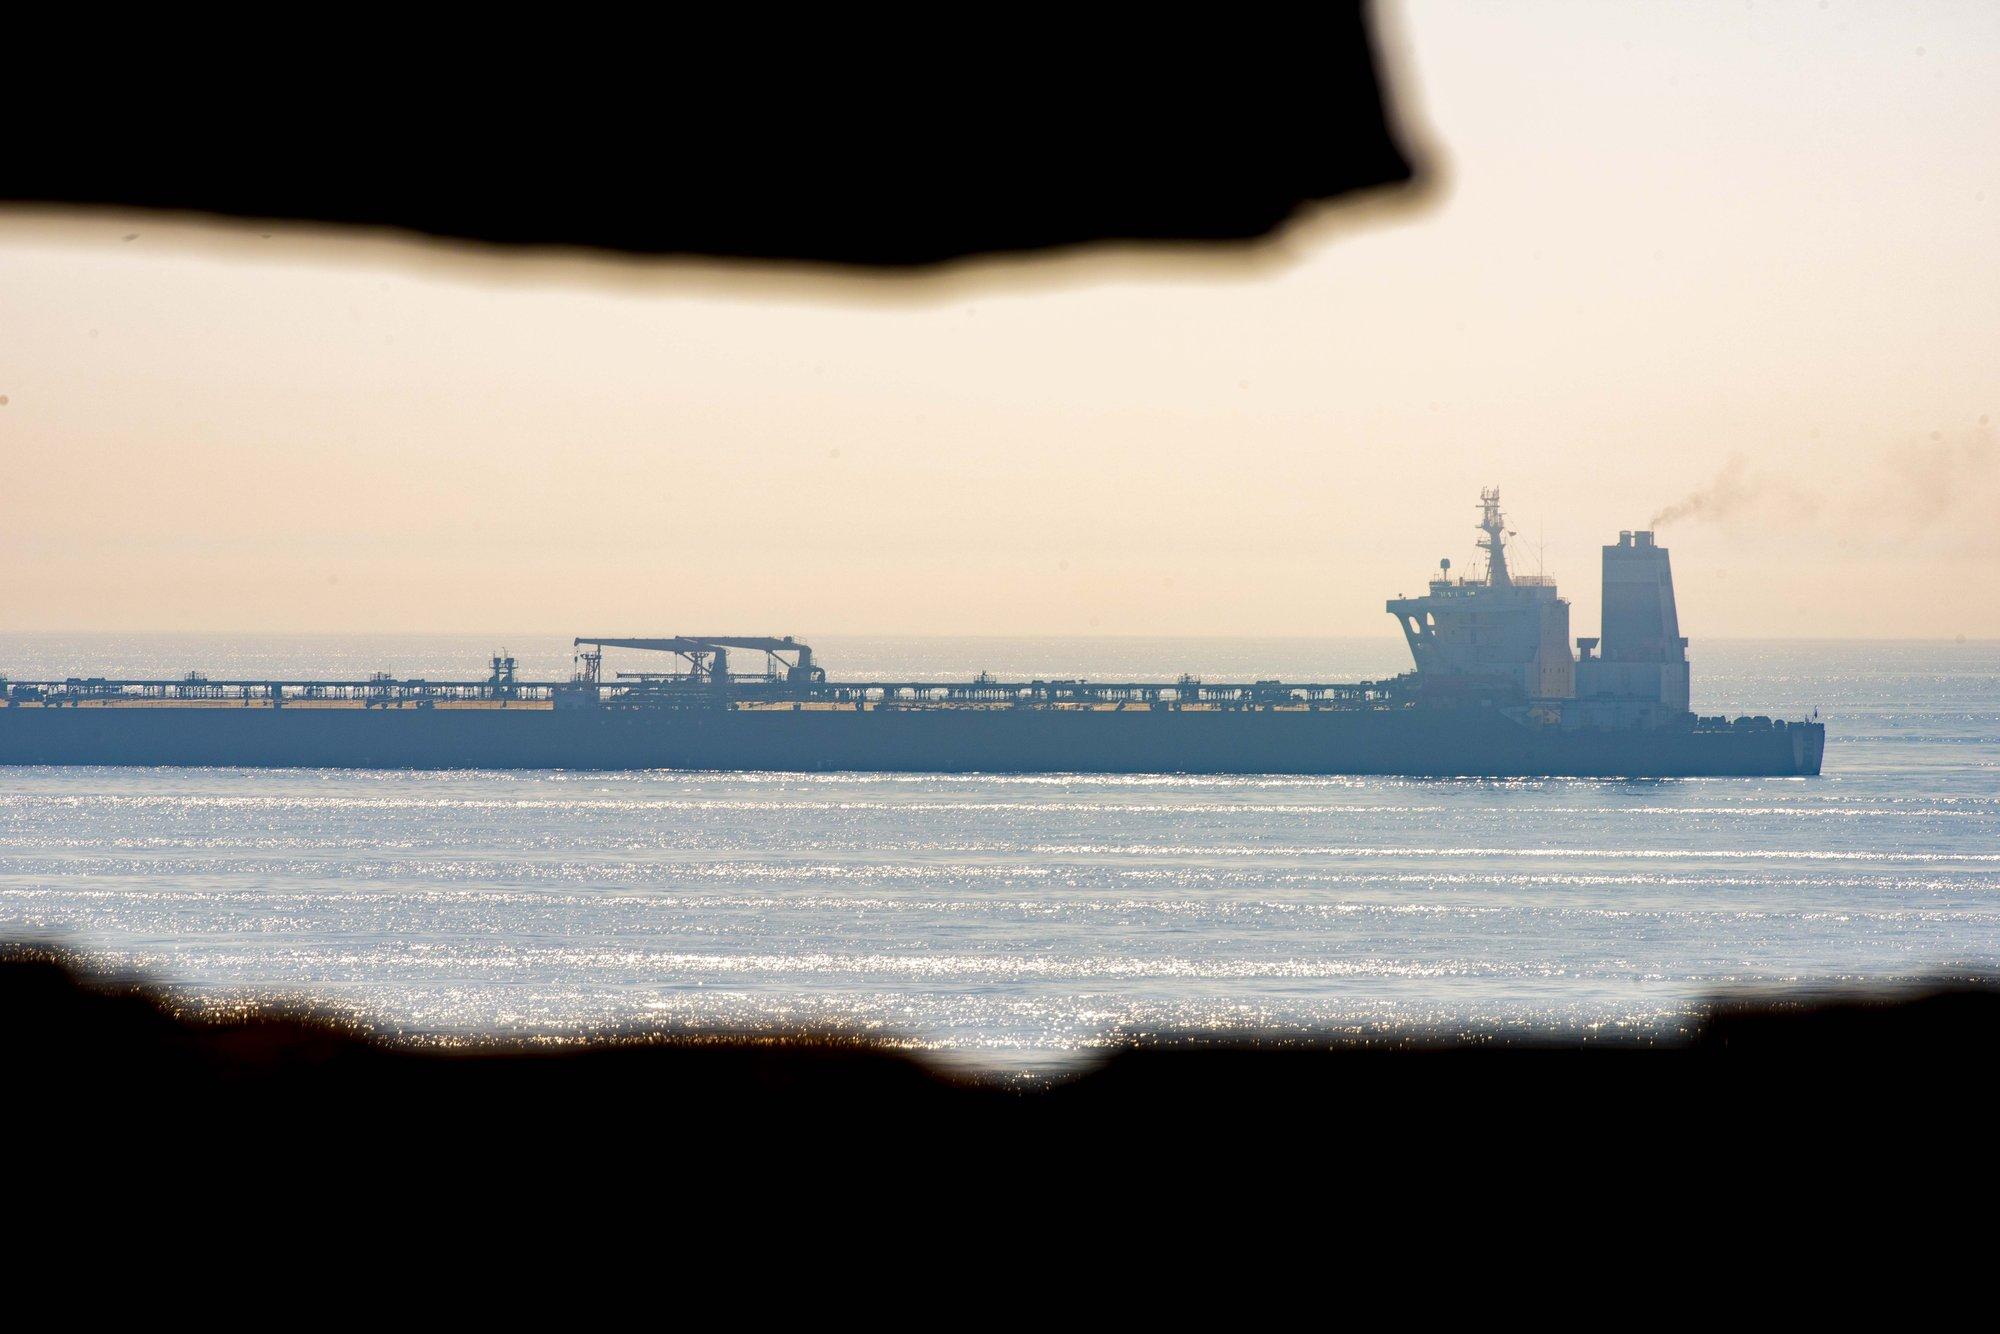 Lawyer: Iranian supertanker captain no longer wants the job